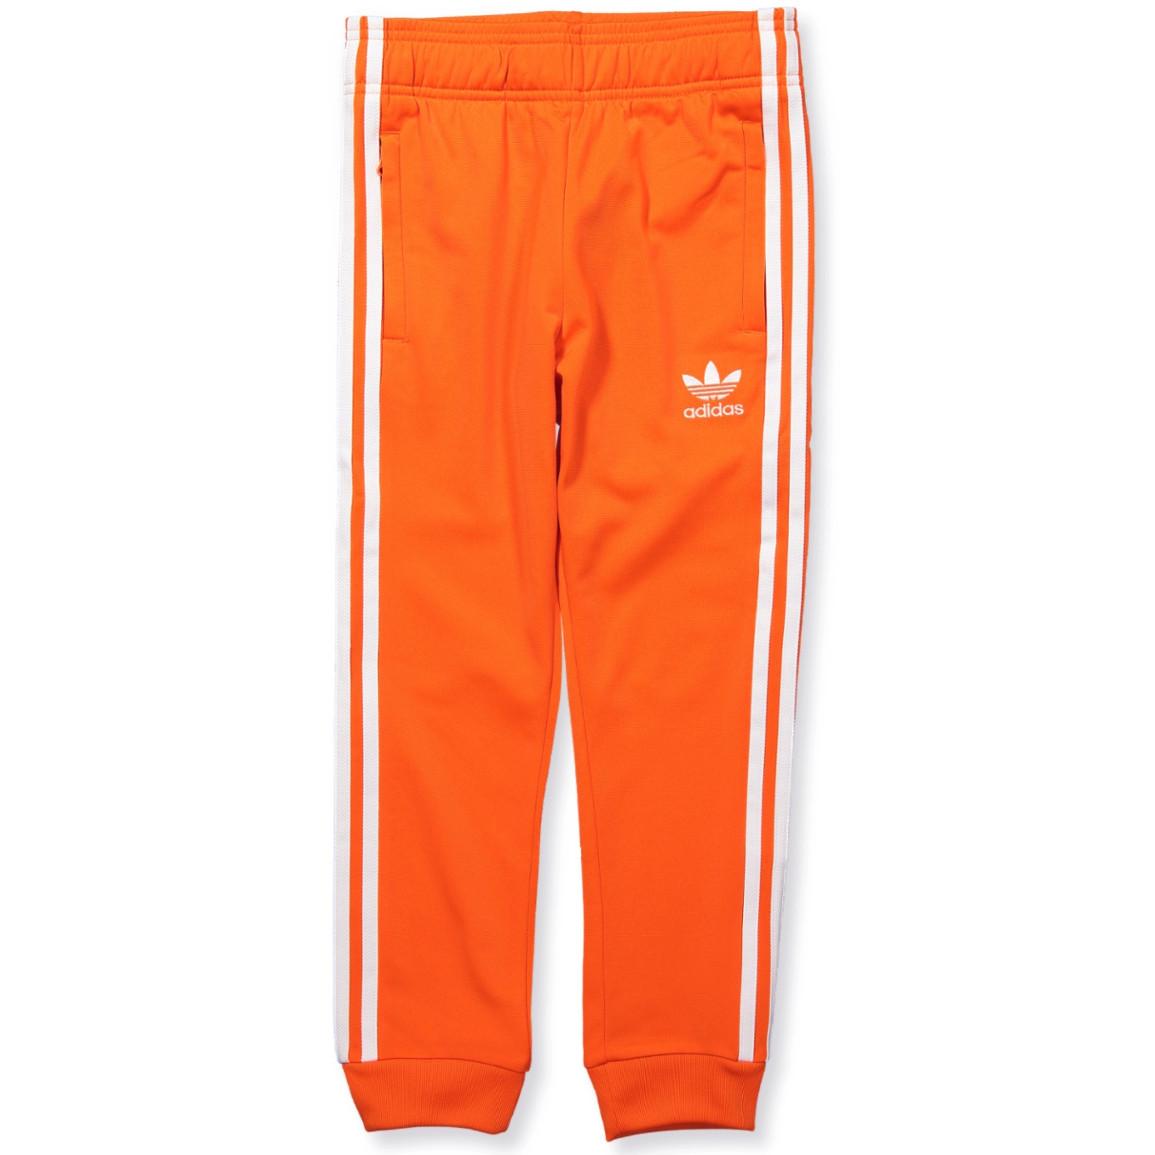 adidas pants orange